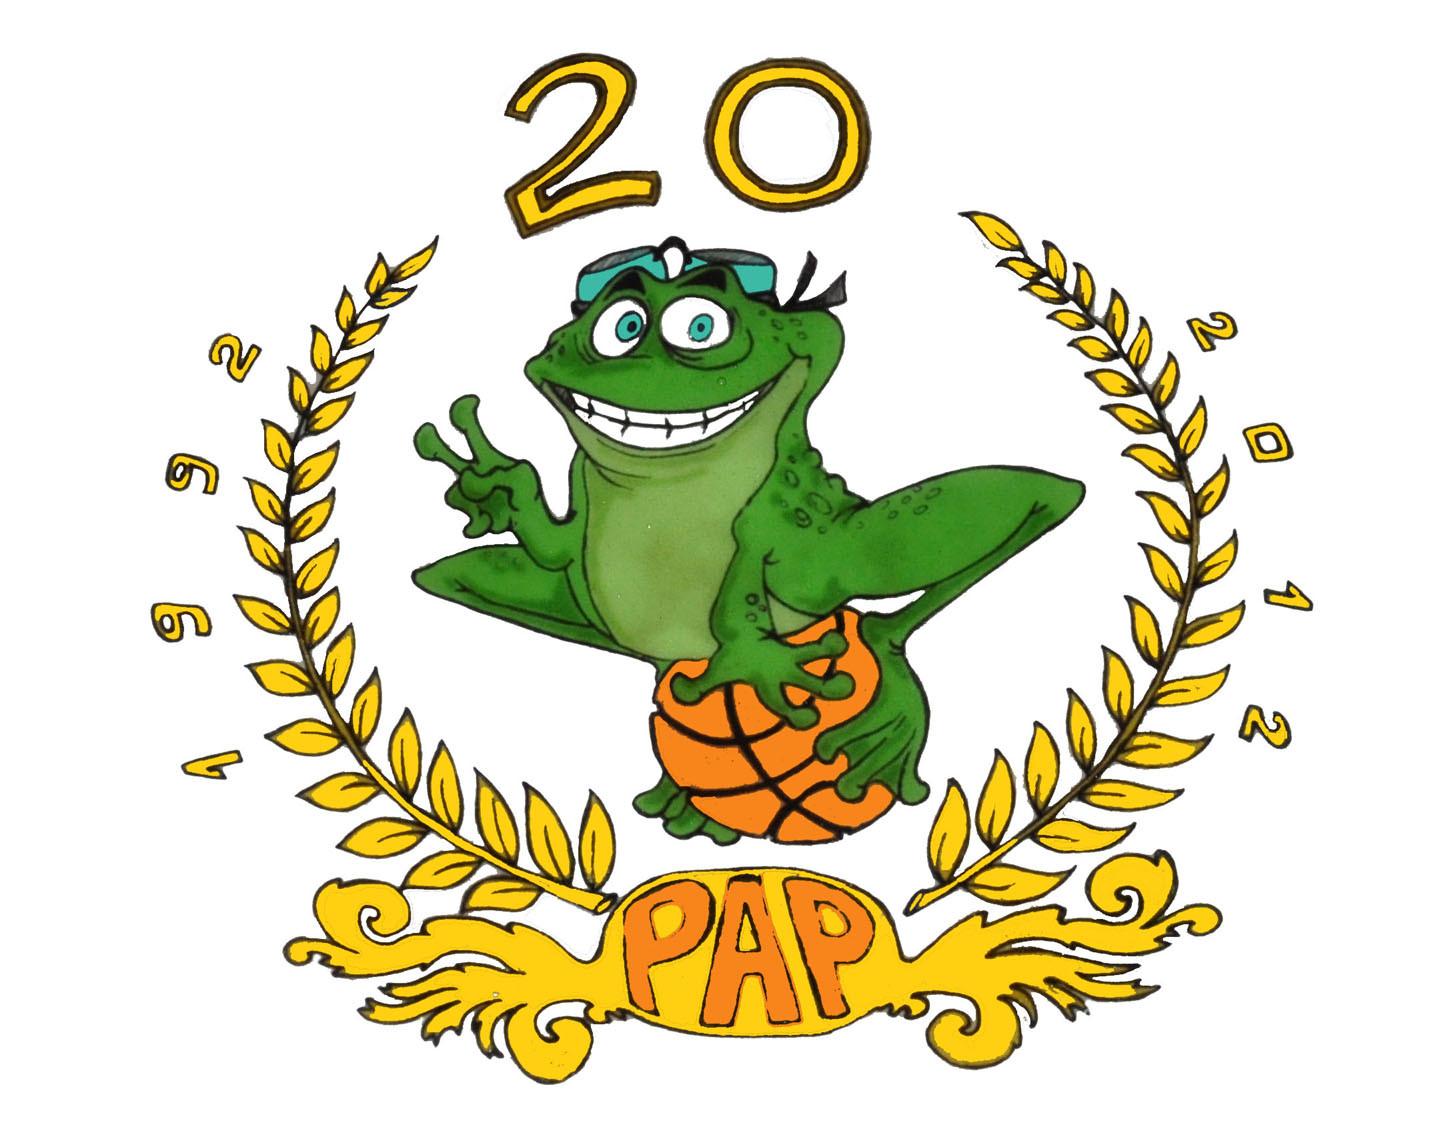 Logo celebrativo Polisportiva 20 anni!!!!